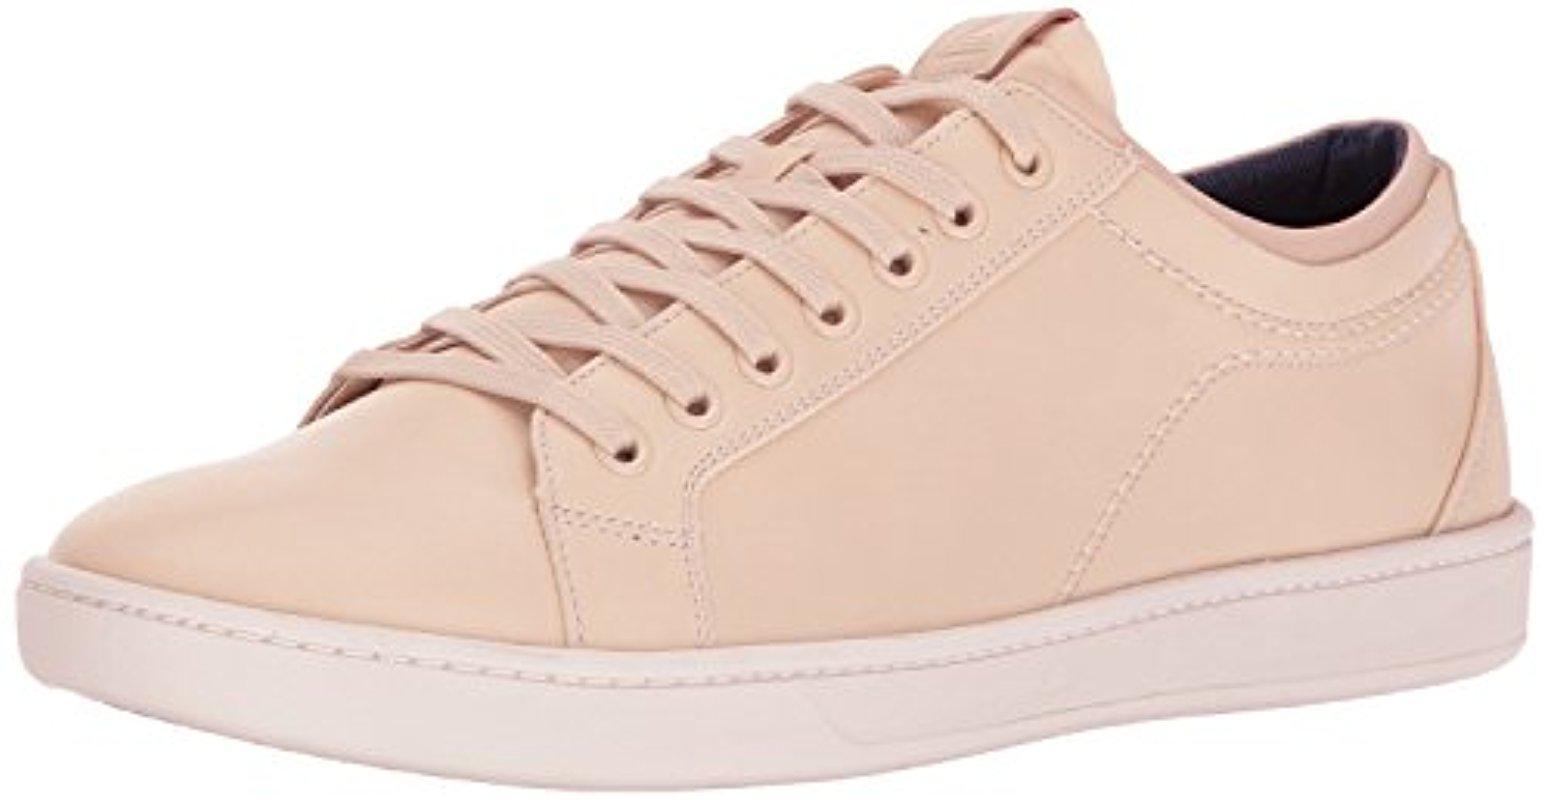 Men's Sigrun-r Fashion Sneaker Khaki 13 D US